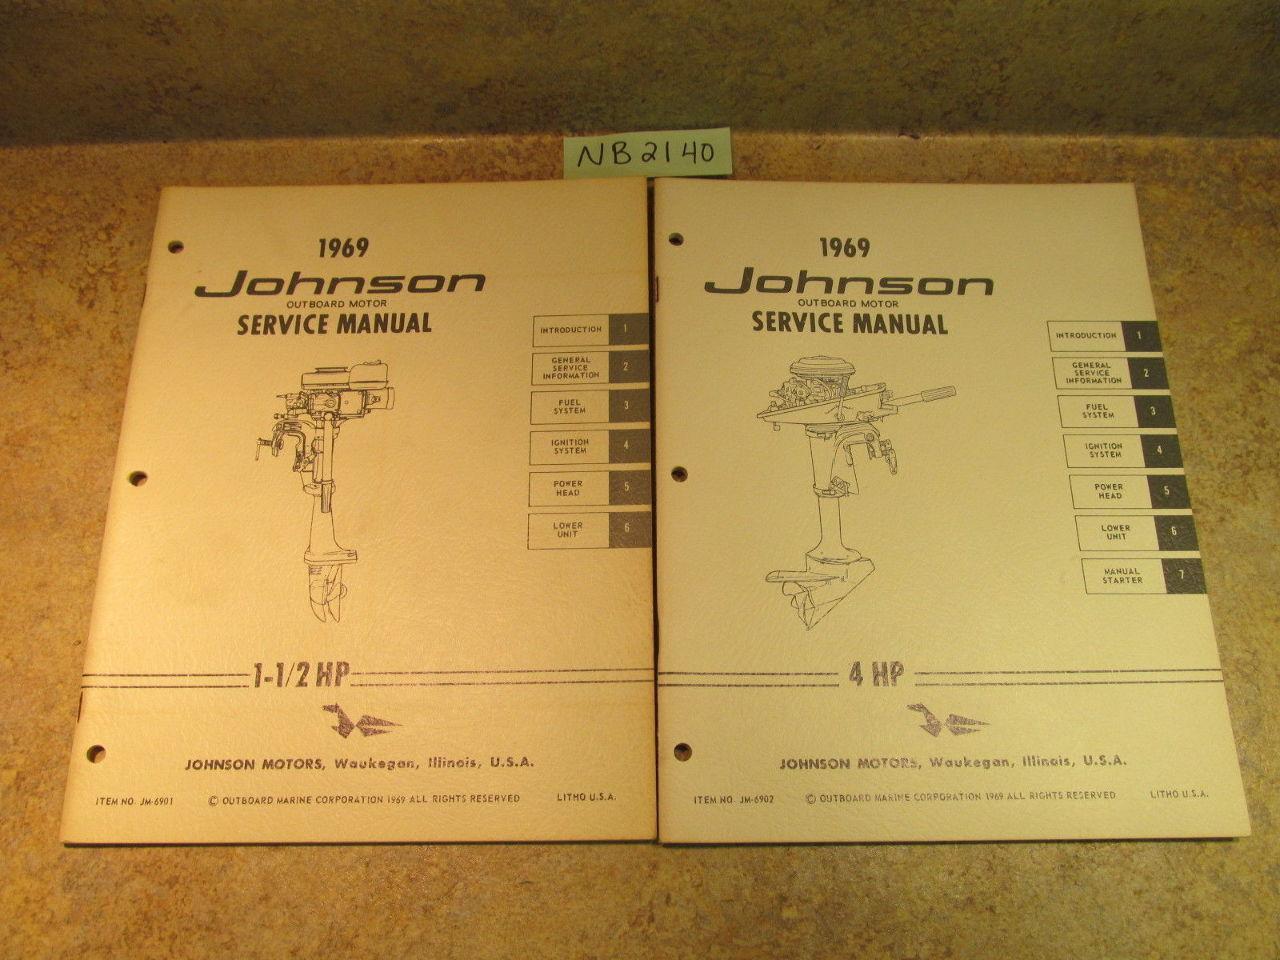 1969 Johnson Outboard Motor Service Manual 115 Hp